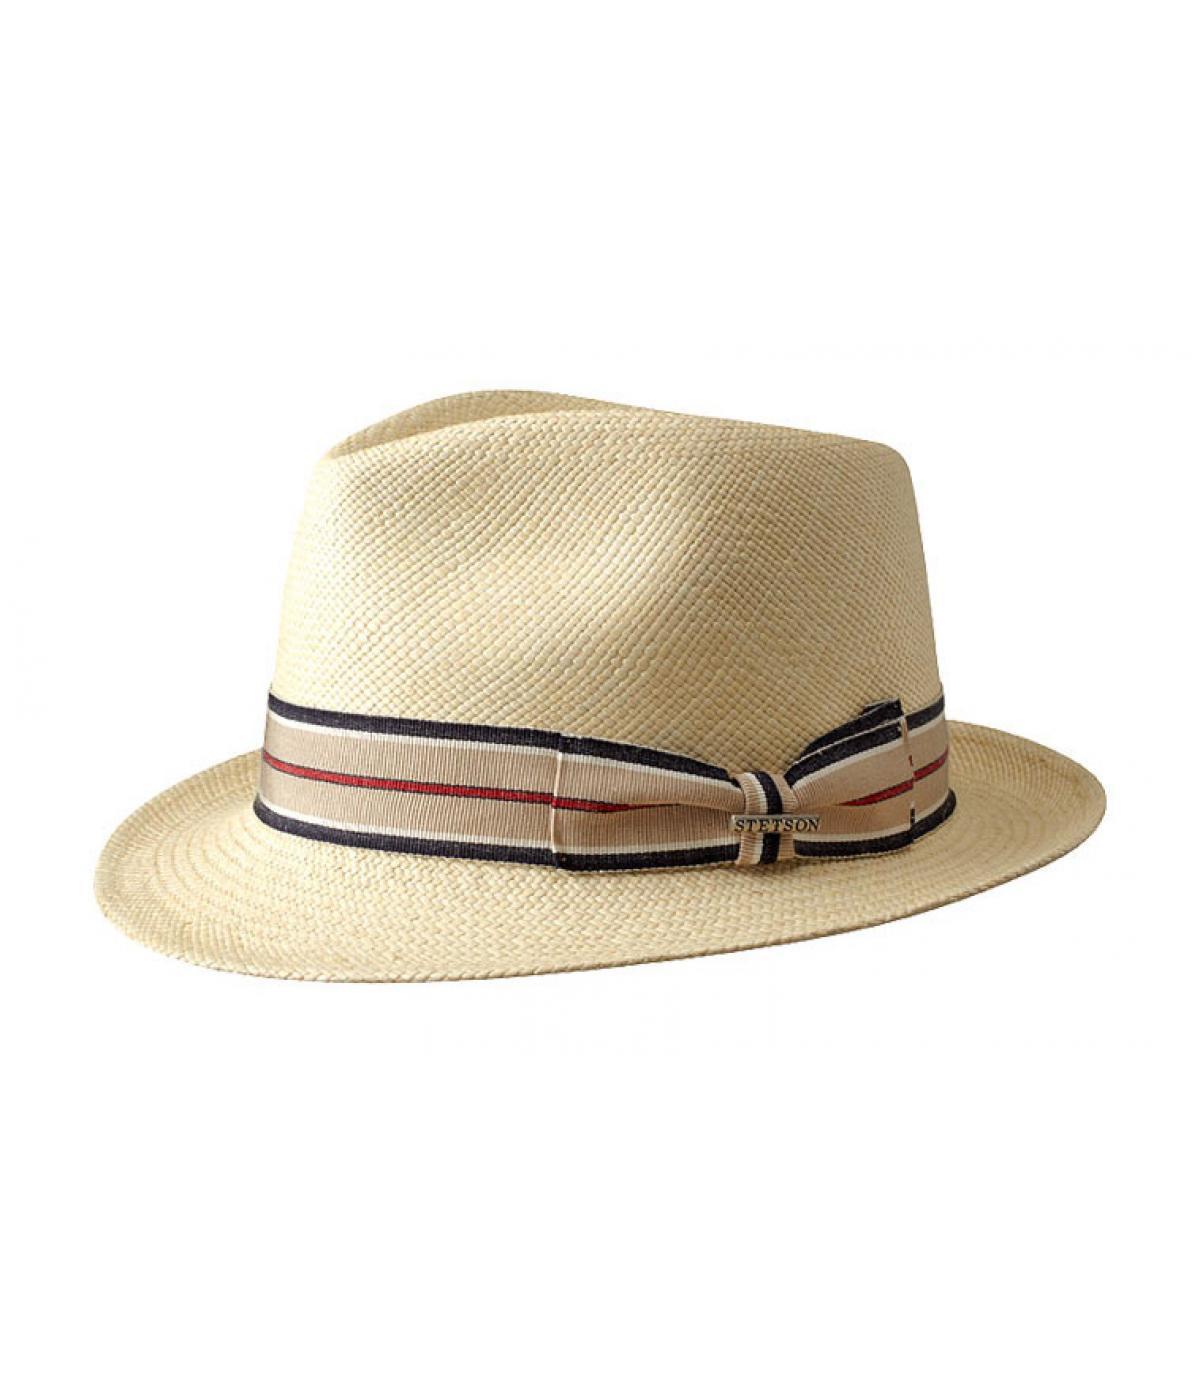 Sombrero paja stetson